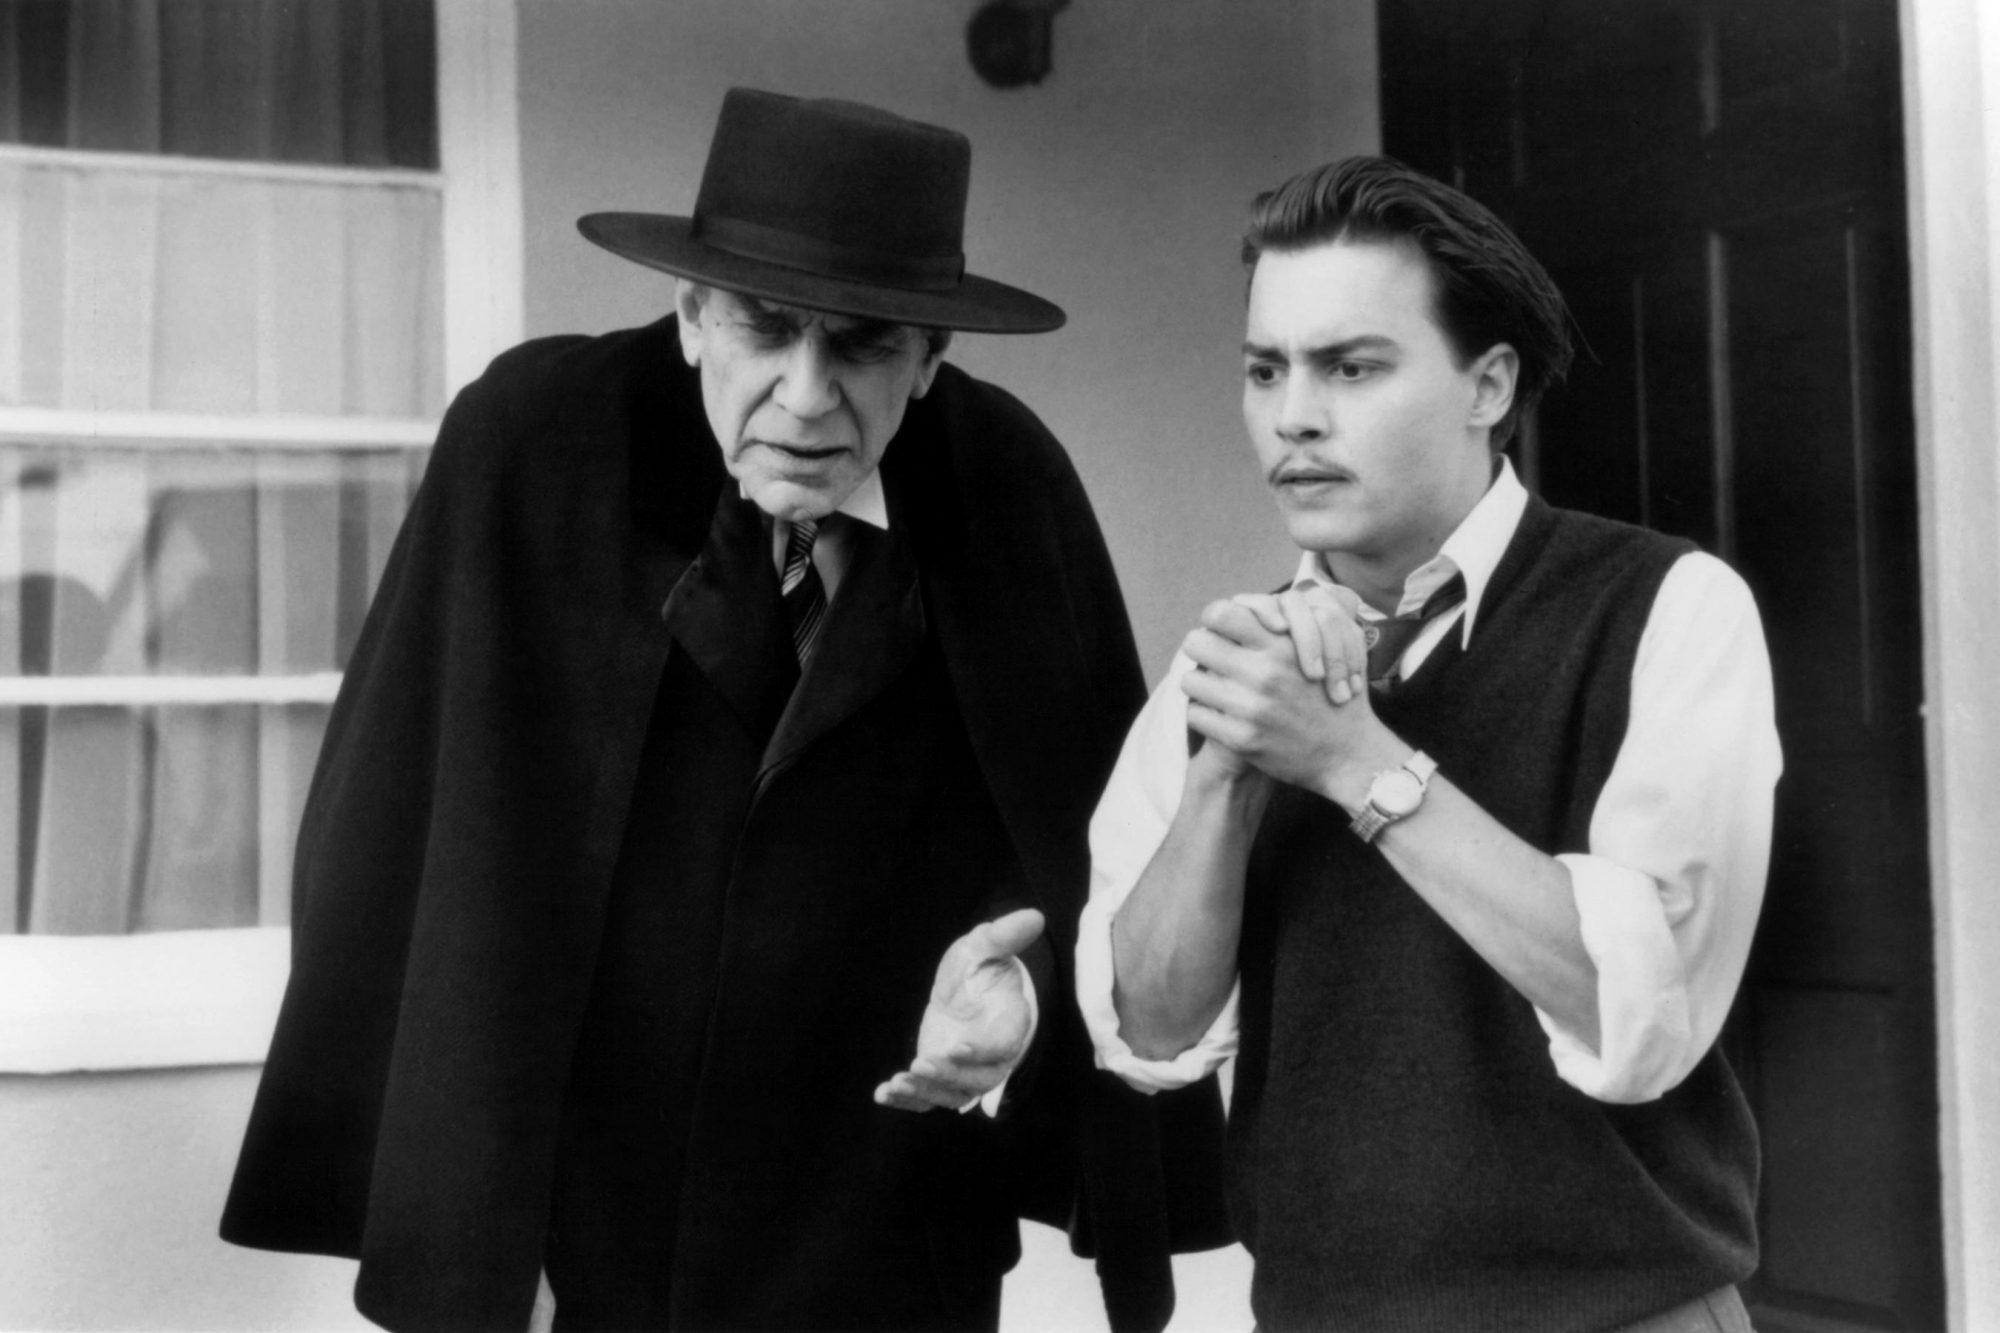 Martin Landau And Johnny Depp In 'Ed Wood'